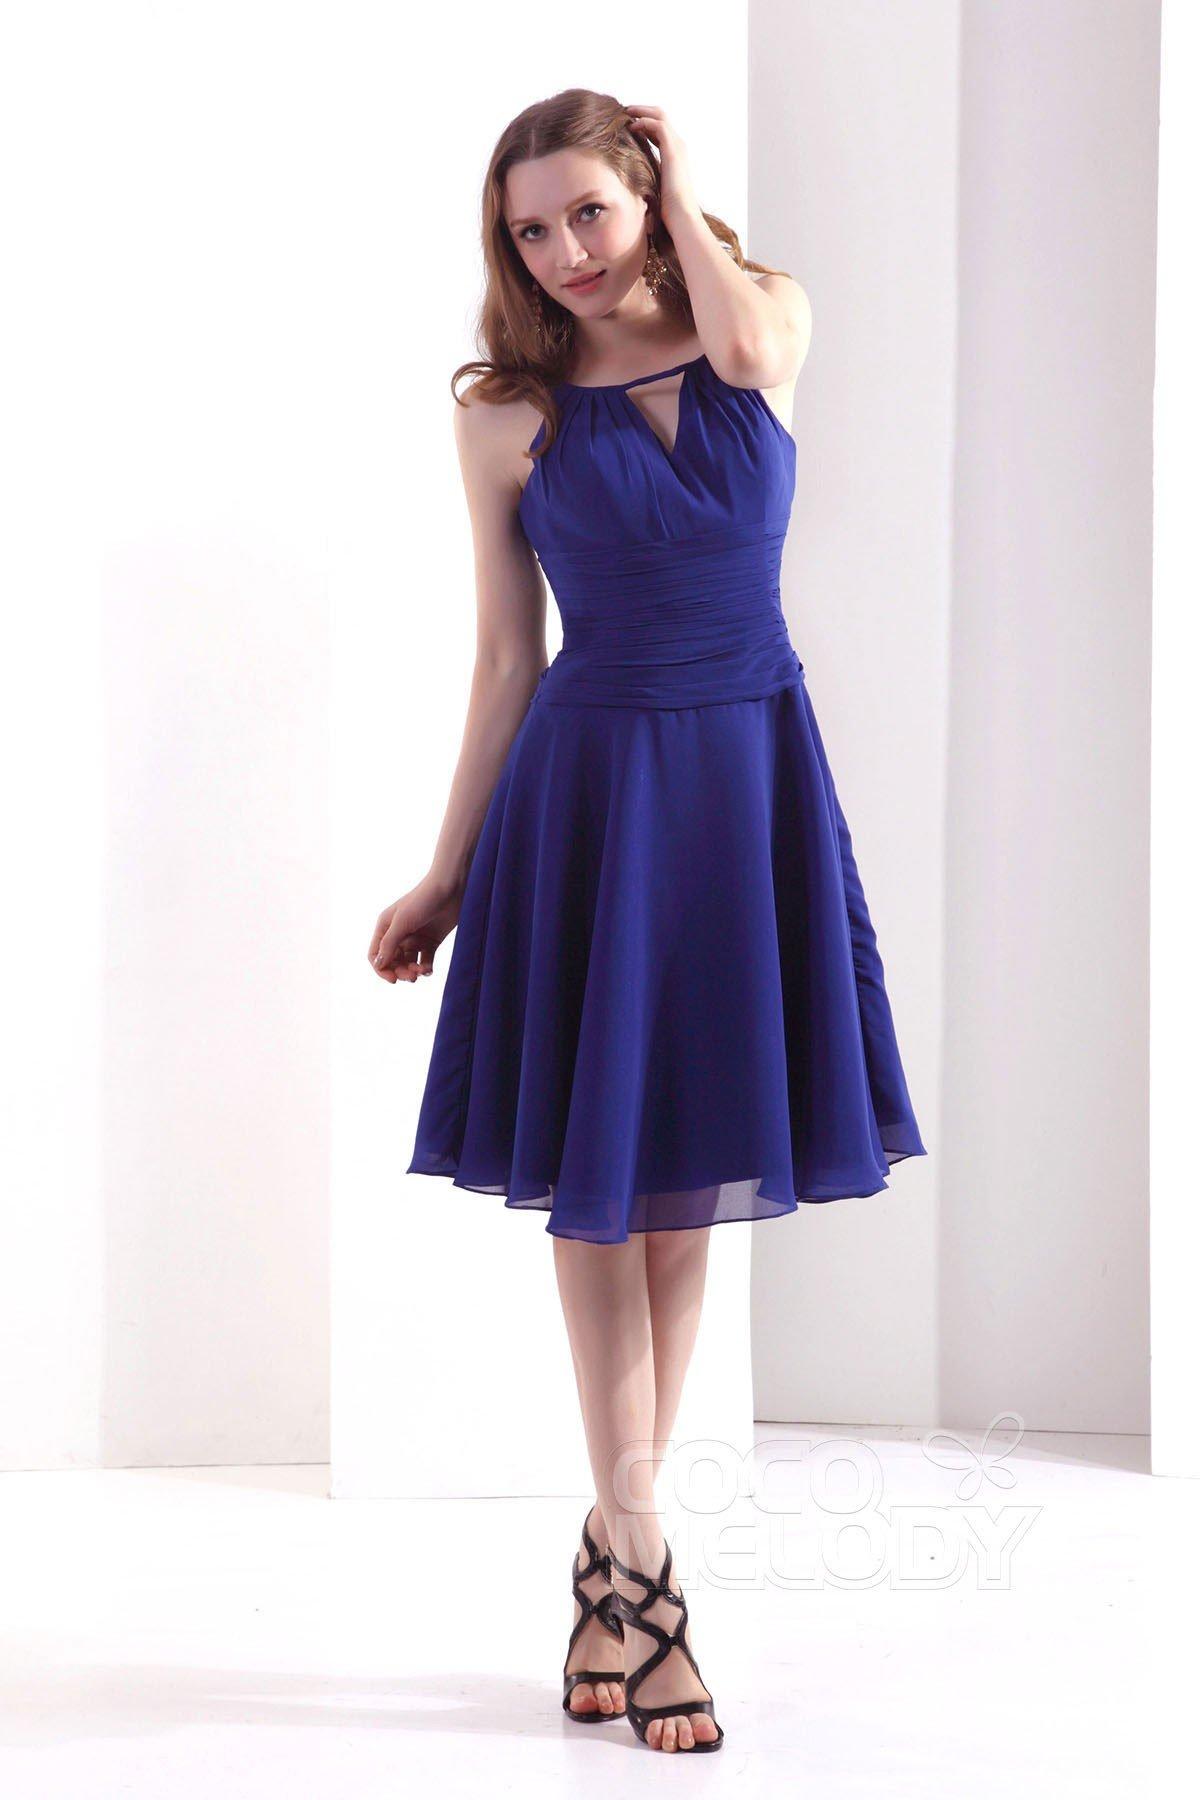 Simple A Line Spaghetti Strap Knee Length Chiffon Sodalite Blue Bridesmaid Dress COZK13011